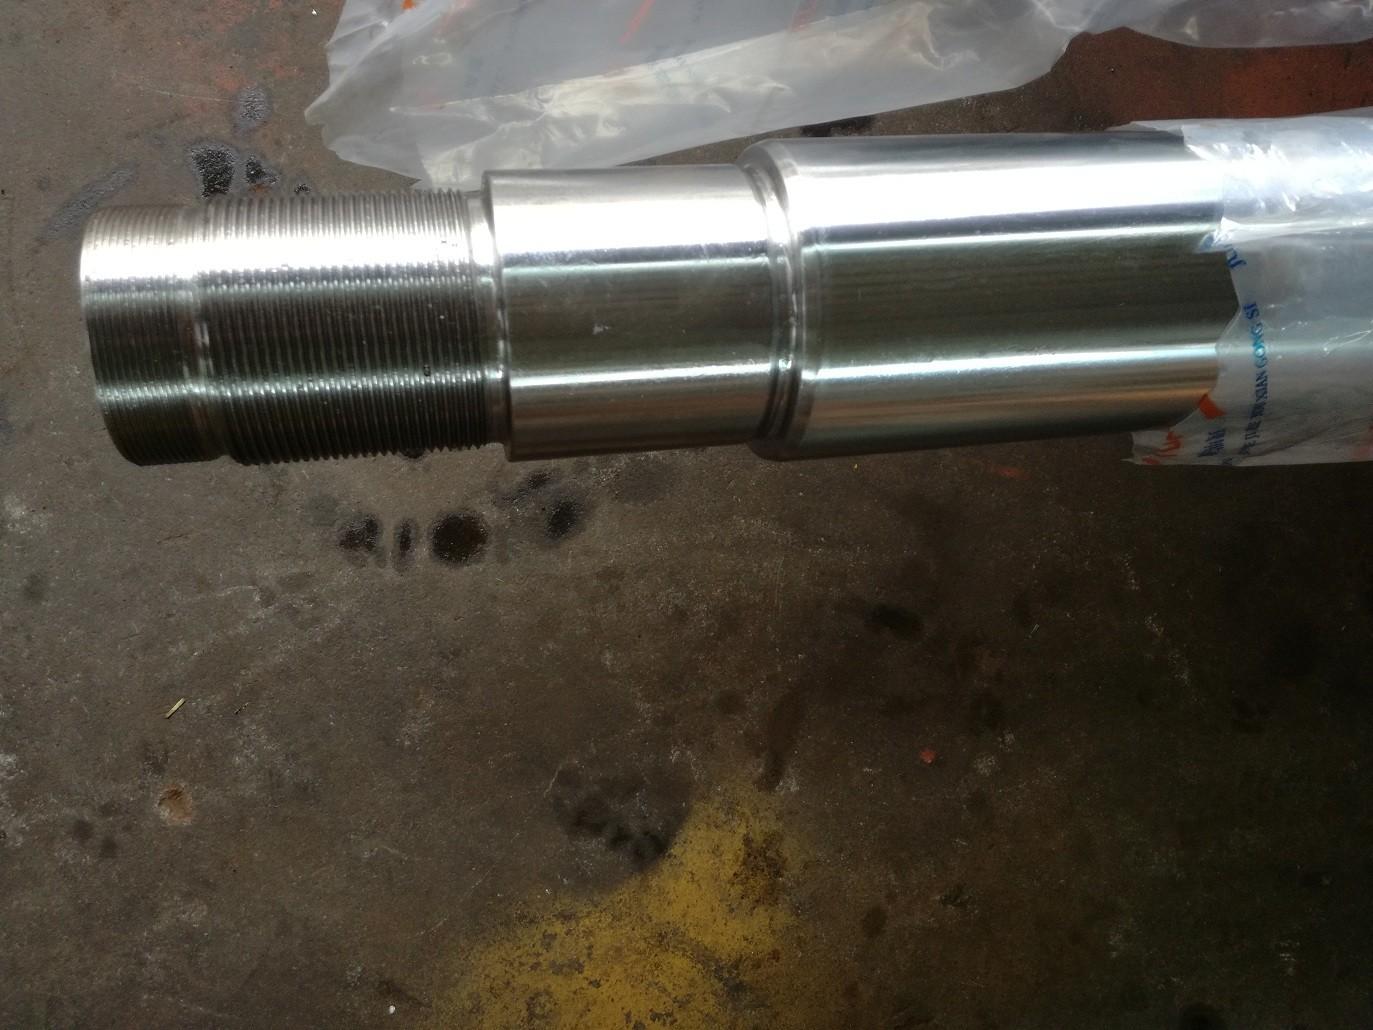 Construction equipment parts, Hyundai R330-9 ARM hydraulic